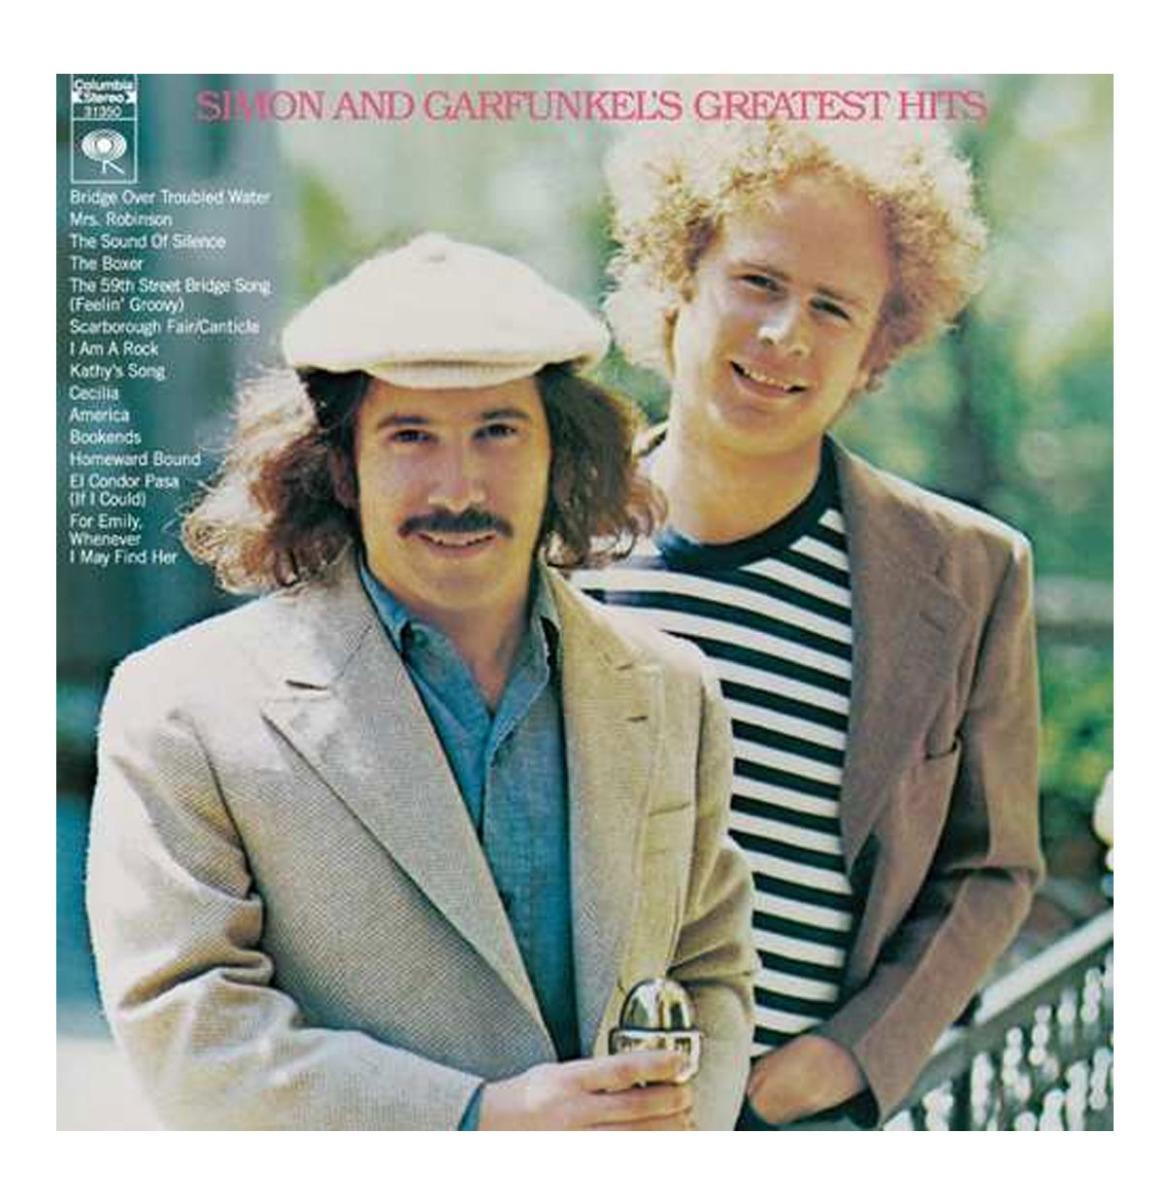 Simon And Garfunkel - Simon And Garfunkel's Greatest Hits LP